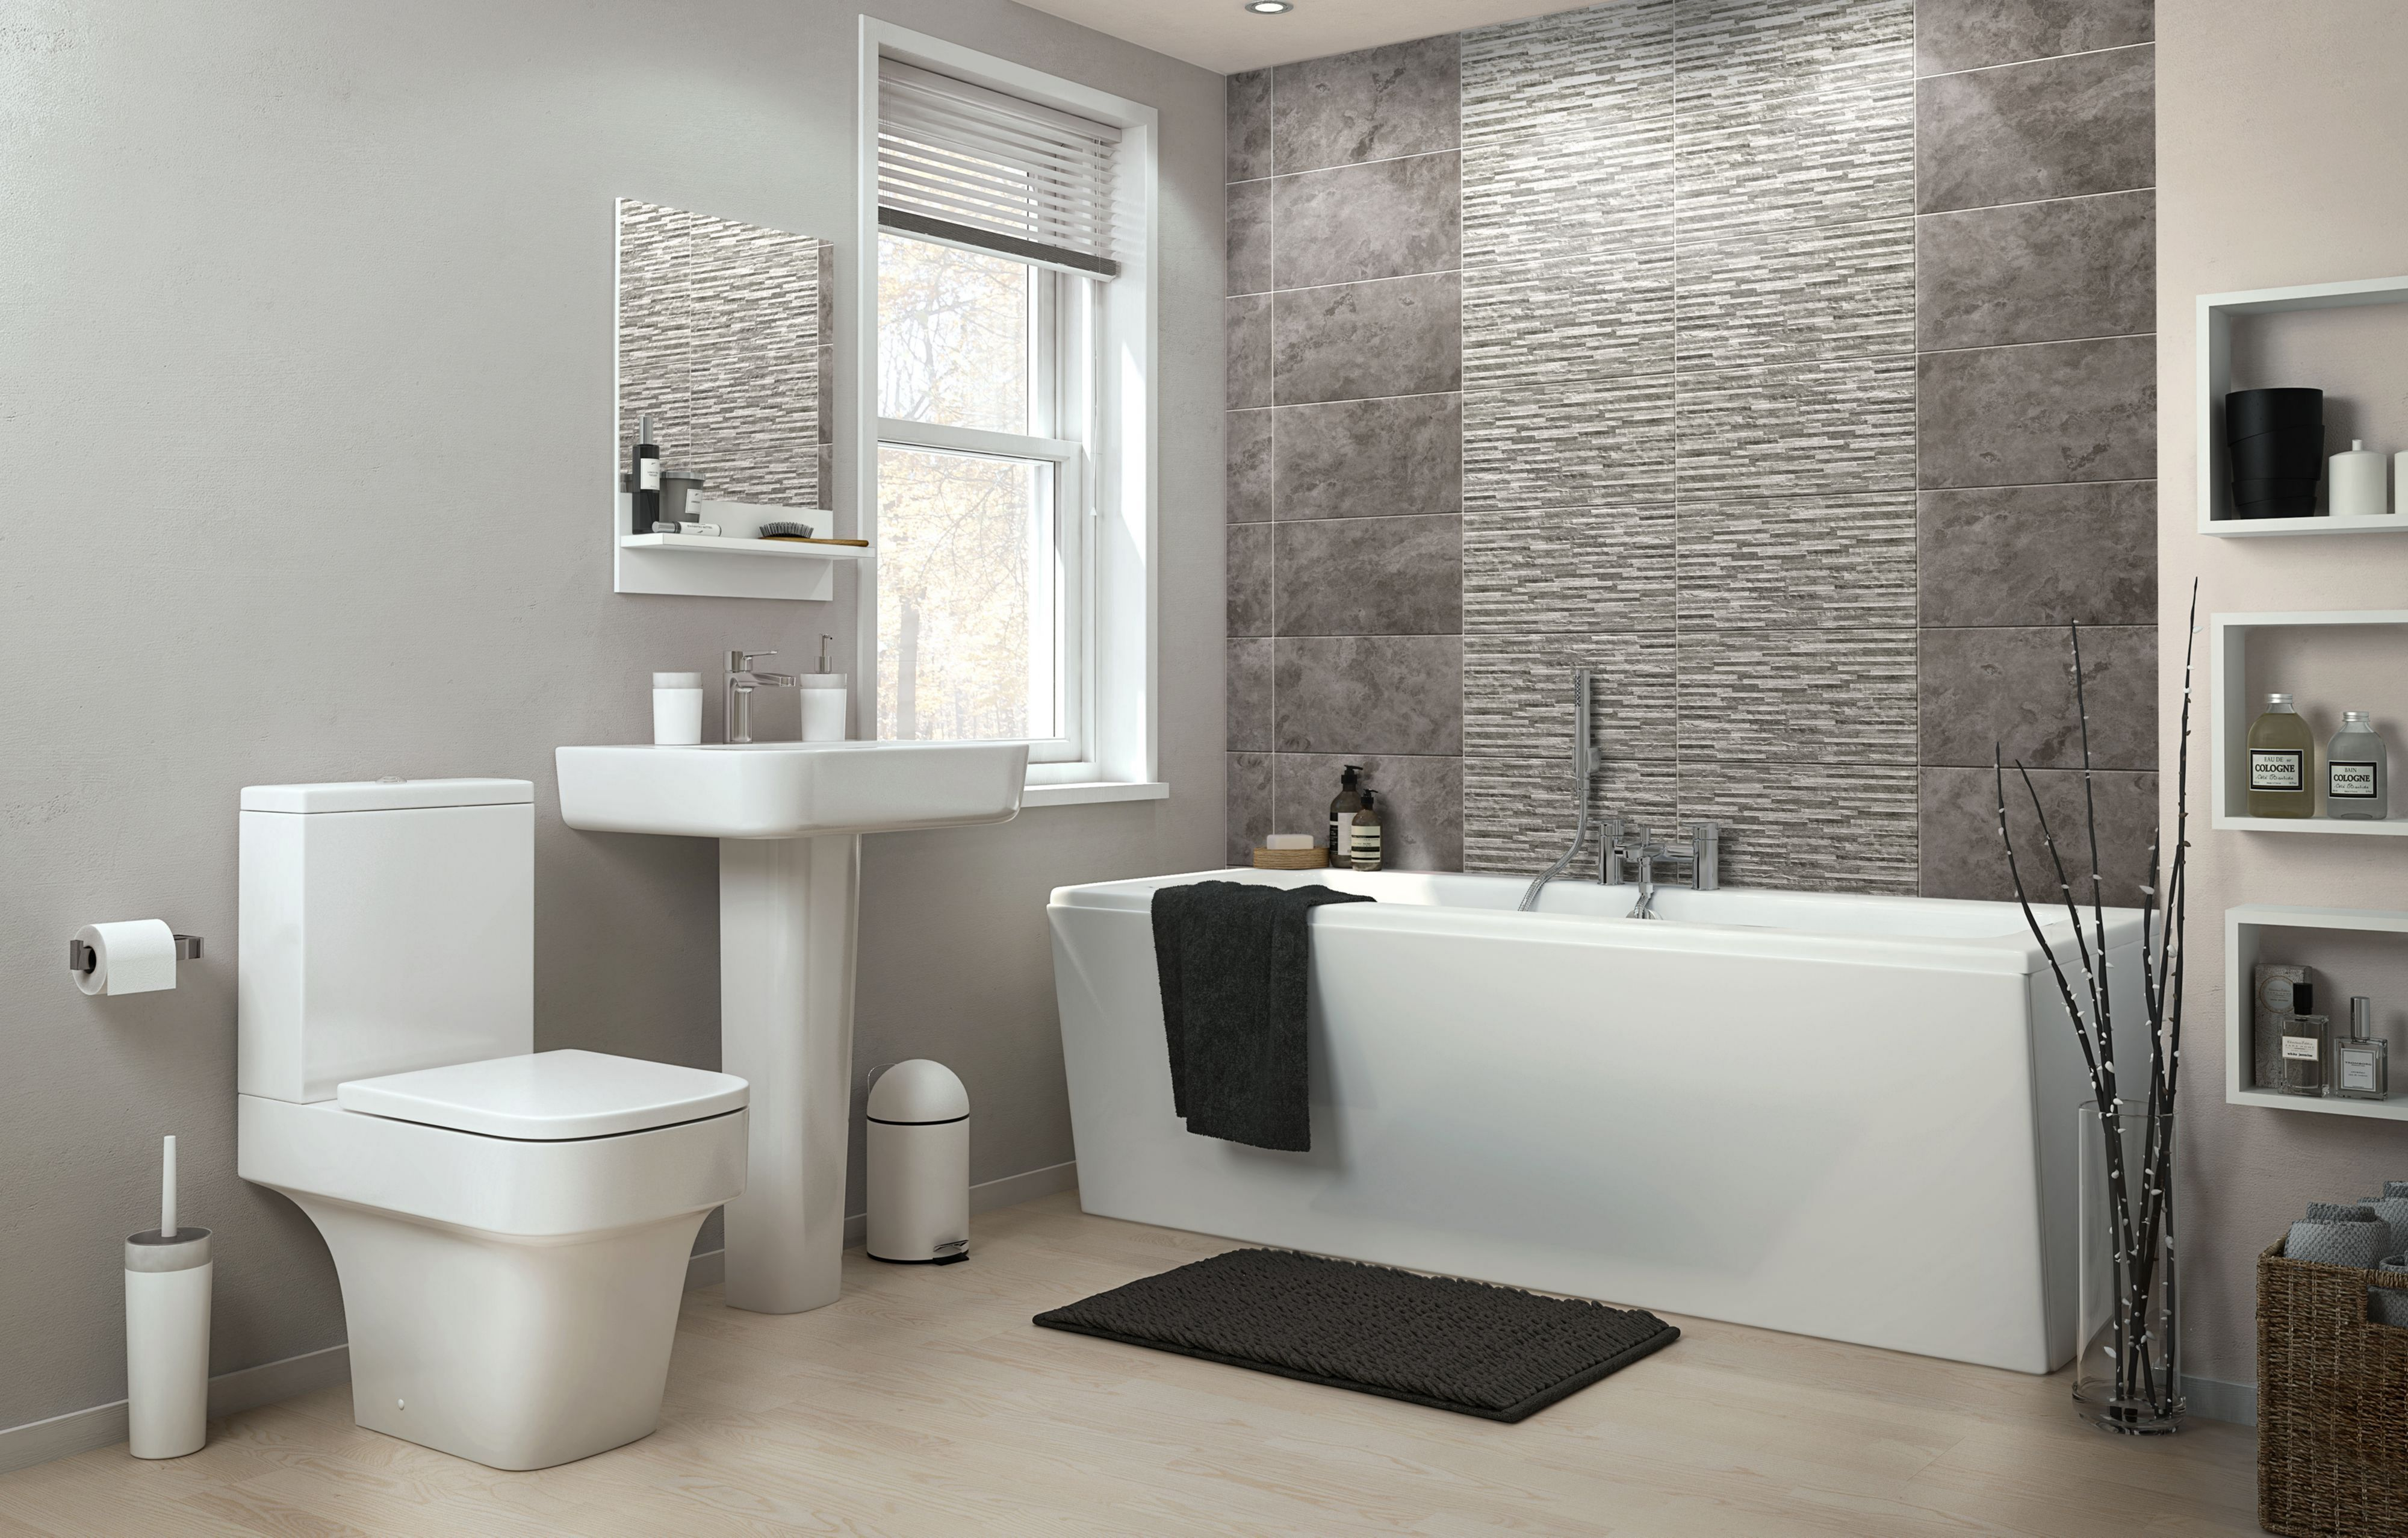 25 Attractive Modern Small Bathroom Designs For Awesome Home Dexorate Bathroom Design Small Modern Simple Bathroom Modern Bathroom